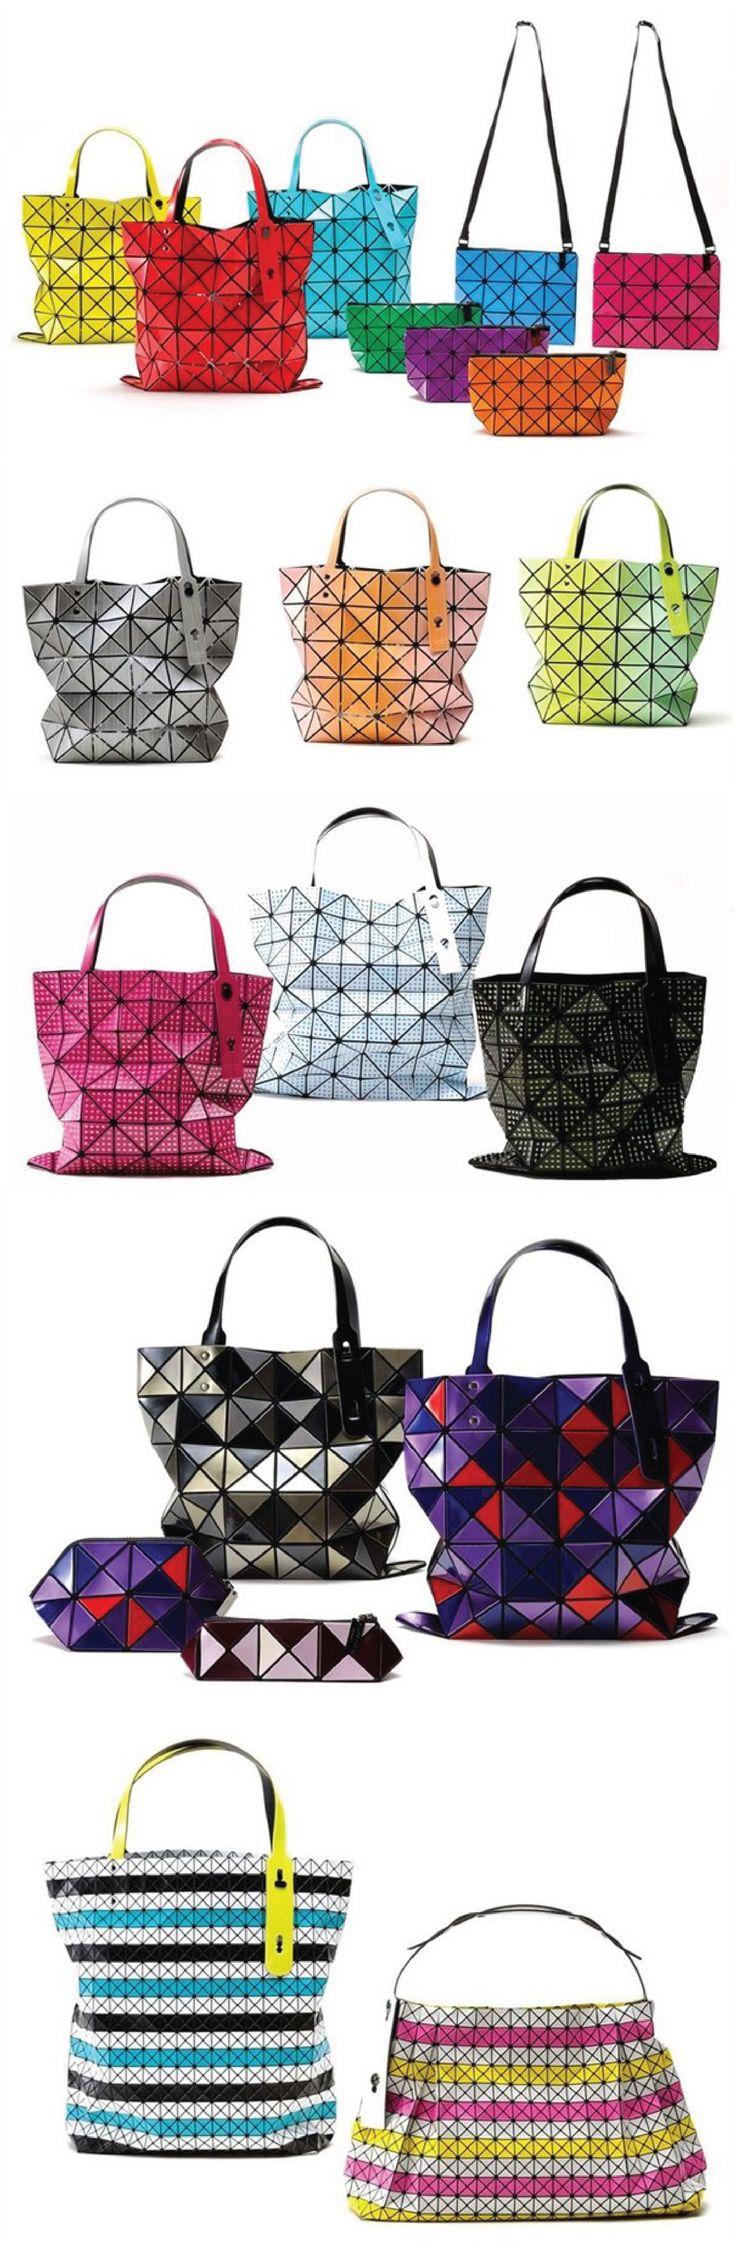 Bao Bao Bags by Issey Miyake